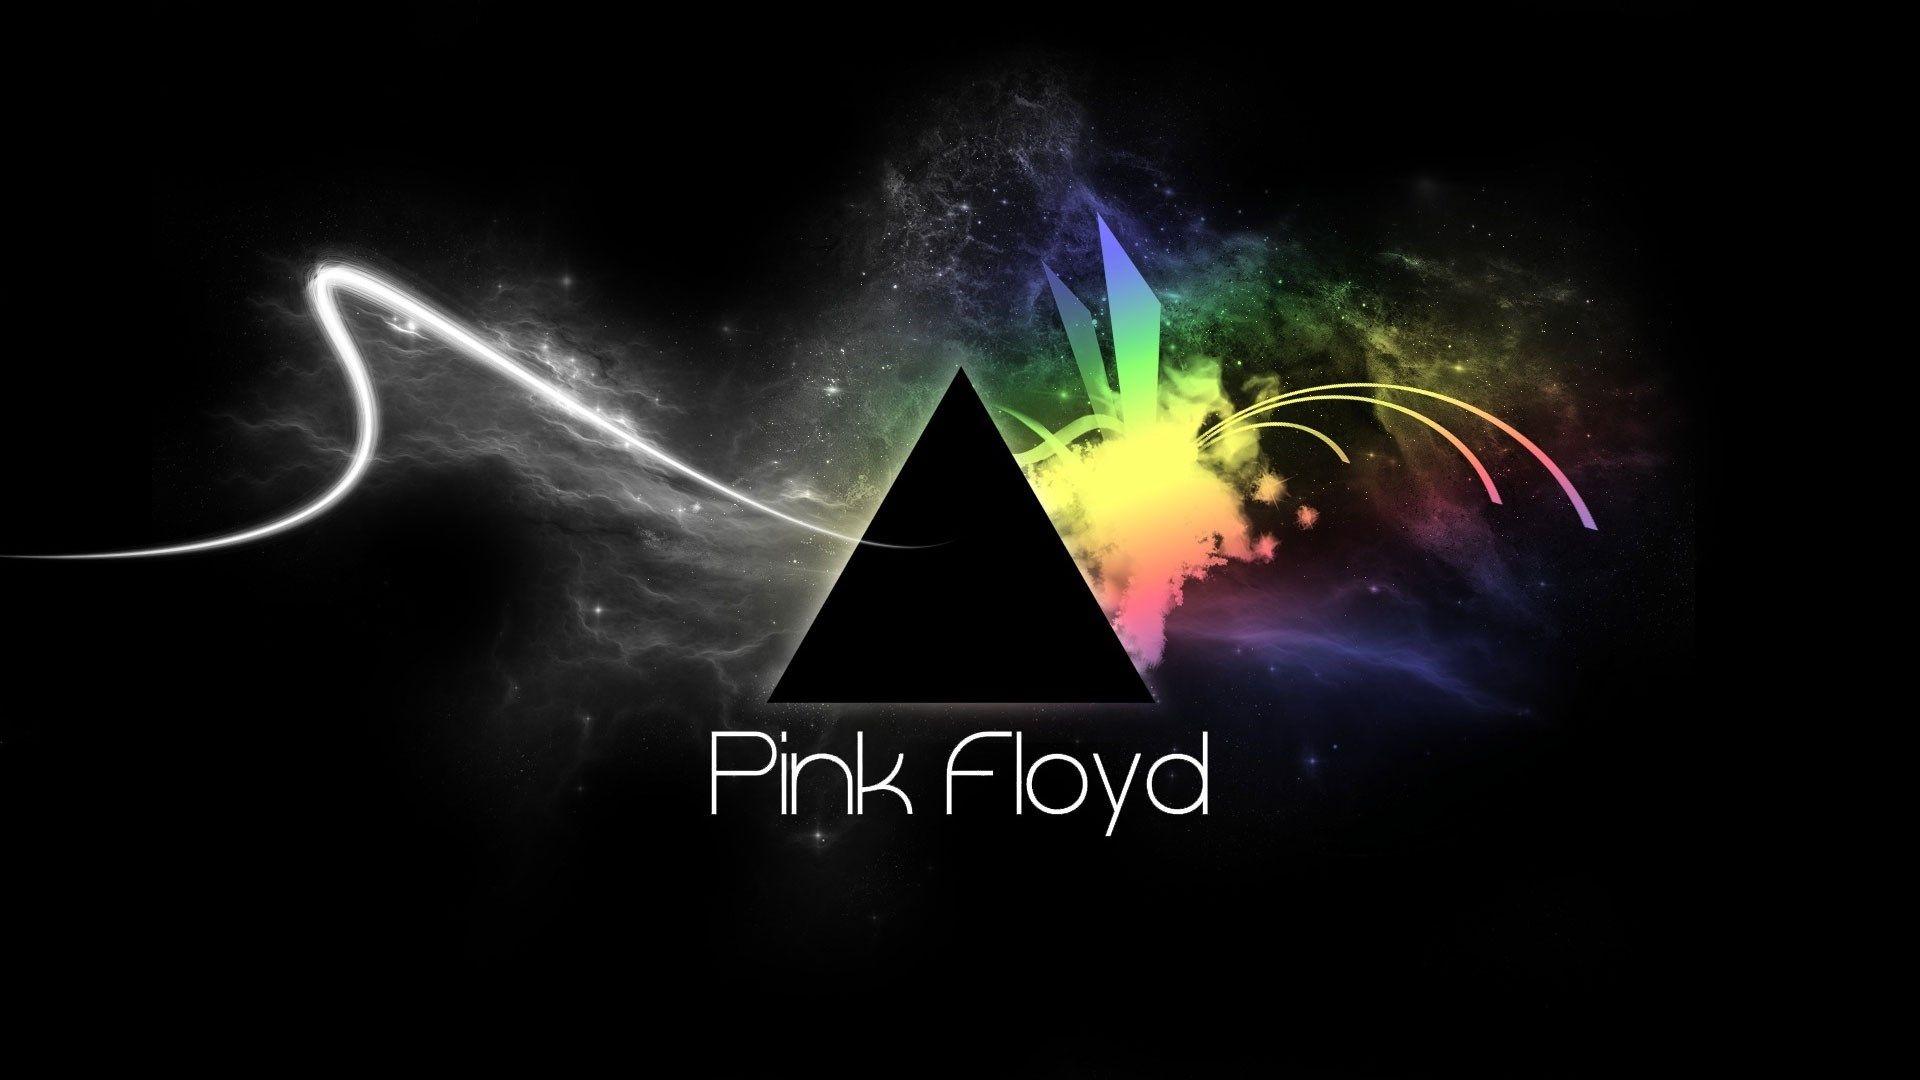 1920x1080 pink floyd wallpaper android JPG 159 kB Pink